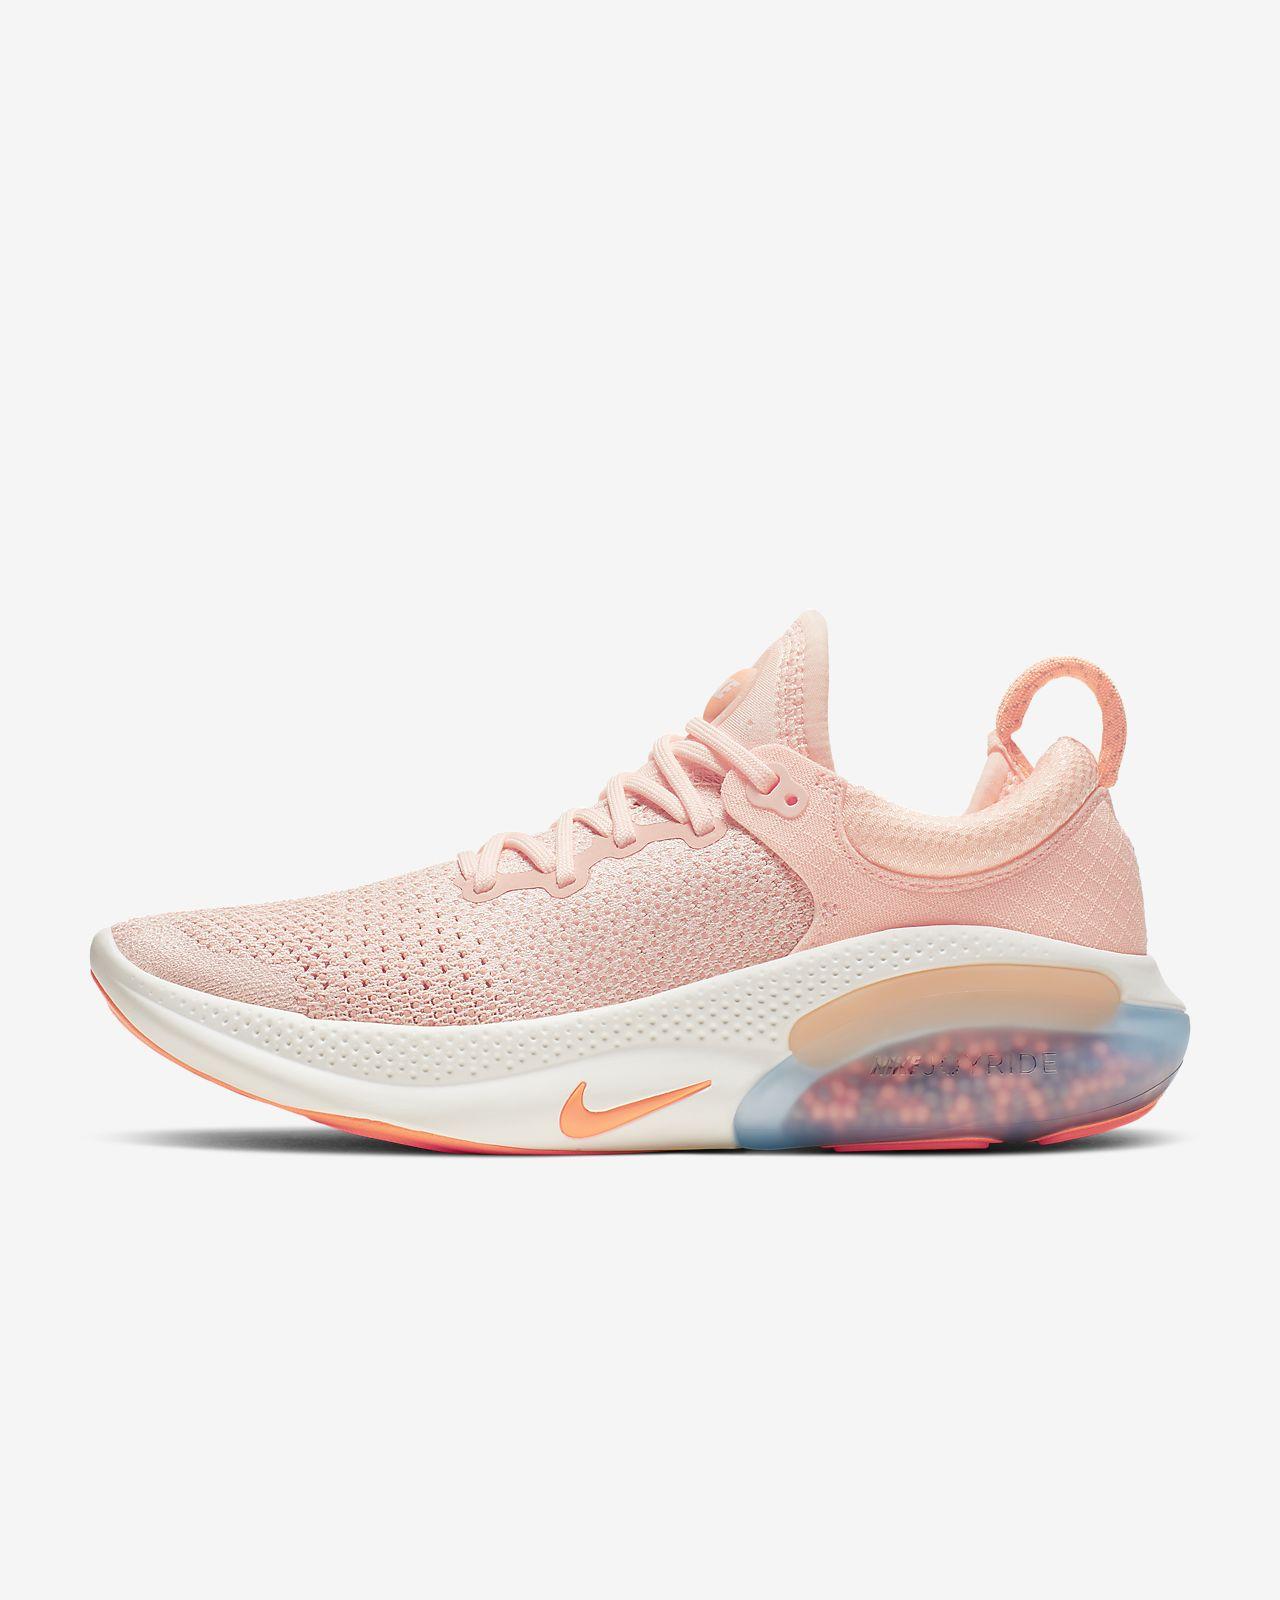 Nike Joyride Run Flyknit Damen-Laufschuh